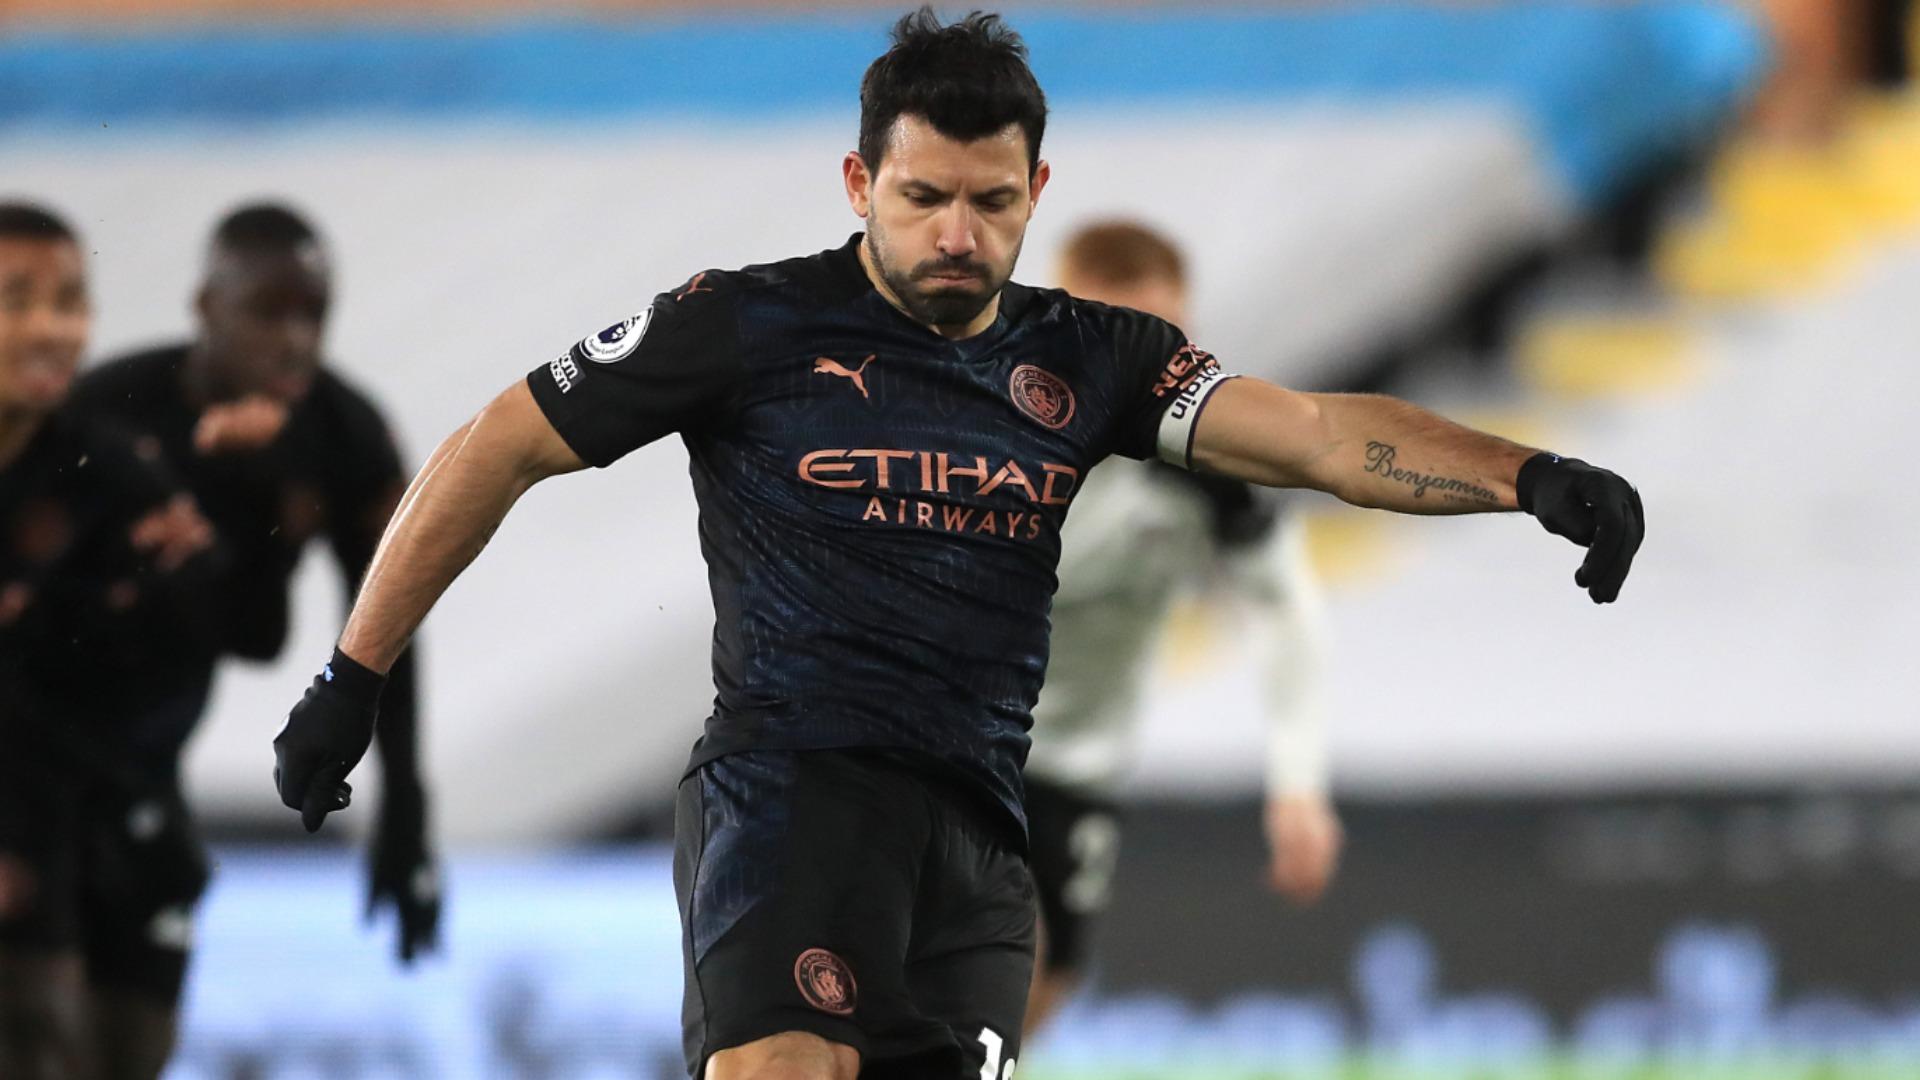 Guardiola and Stones thrilled as Aguero ends Premier League drought